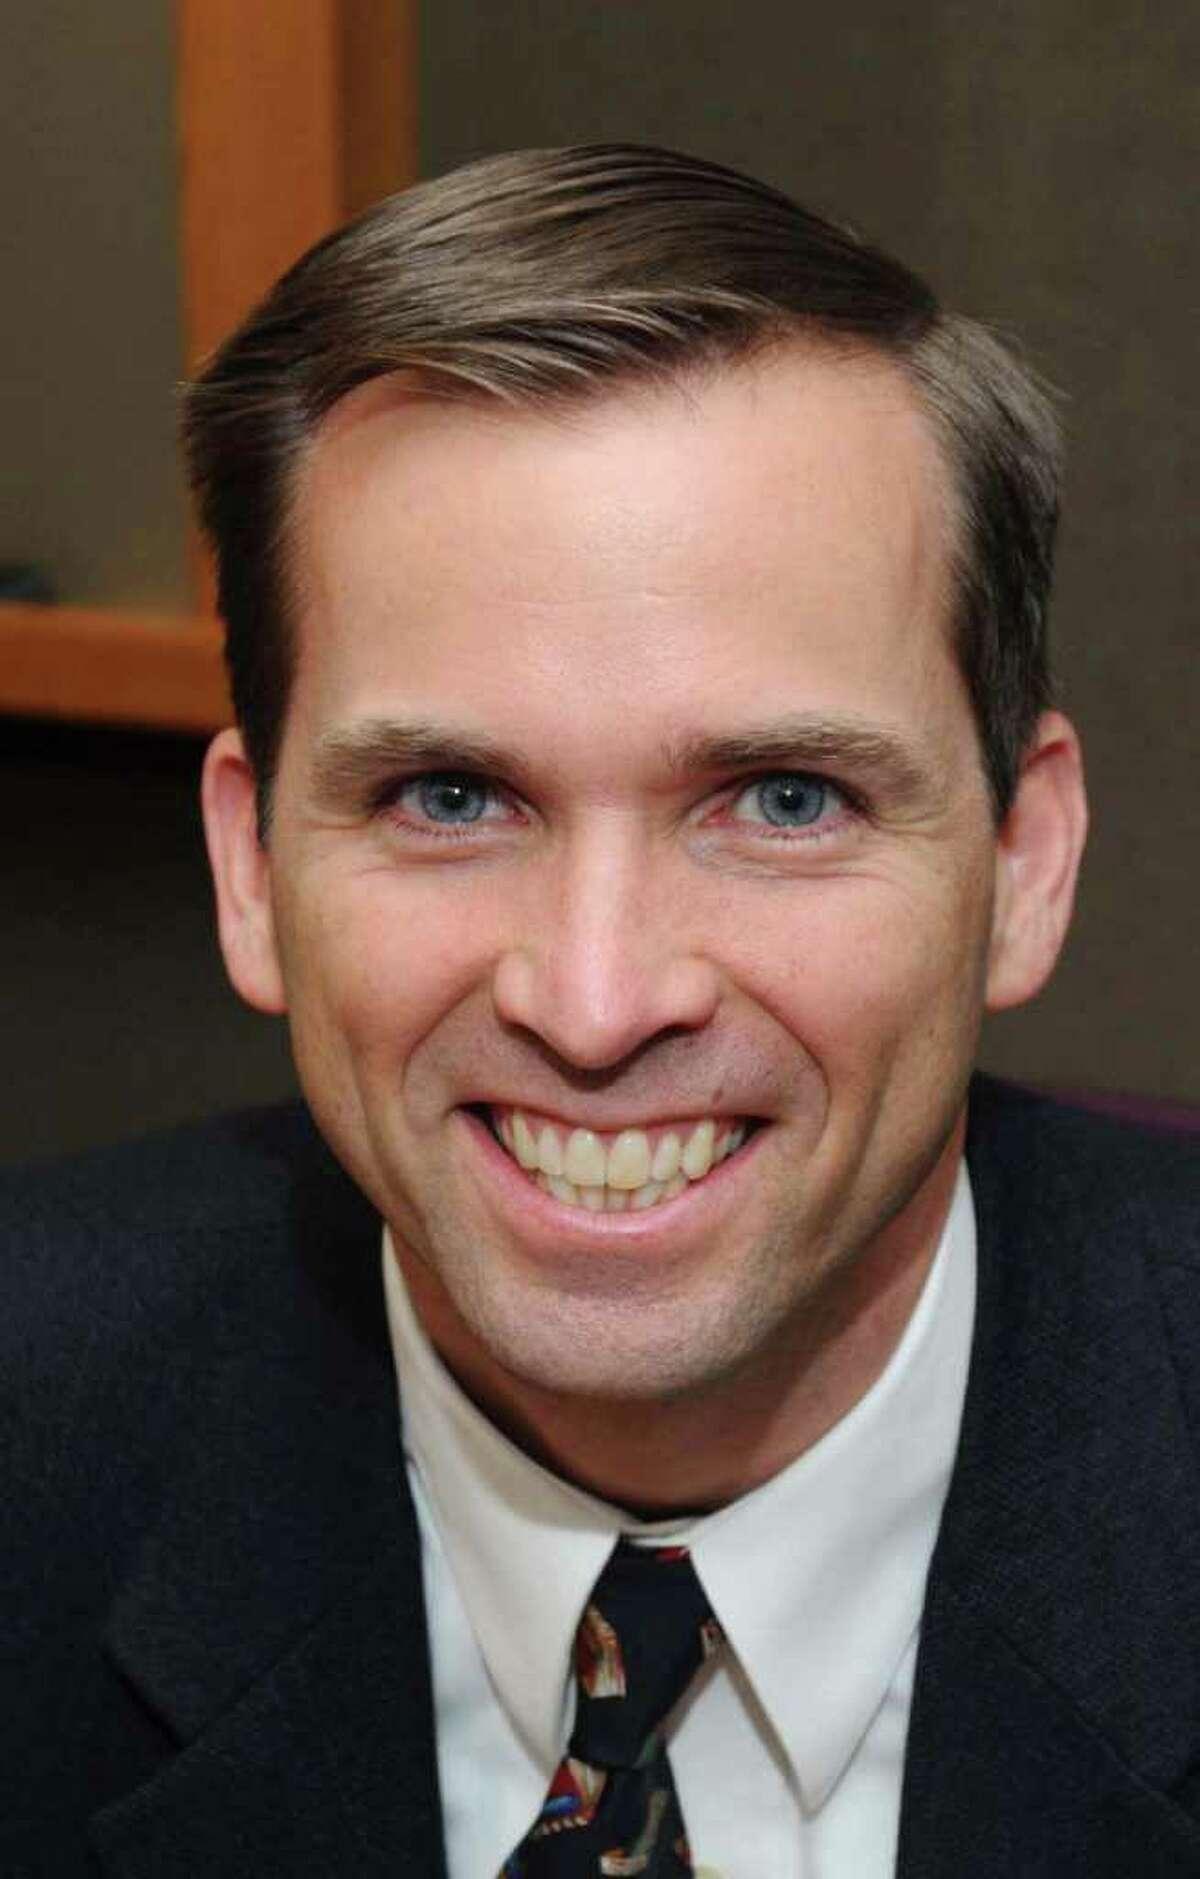 Dr. Christopher Kukk, of Brookfield .